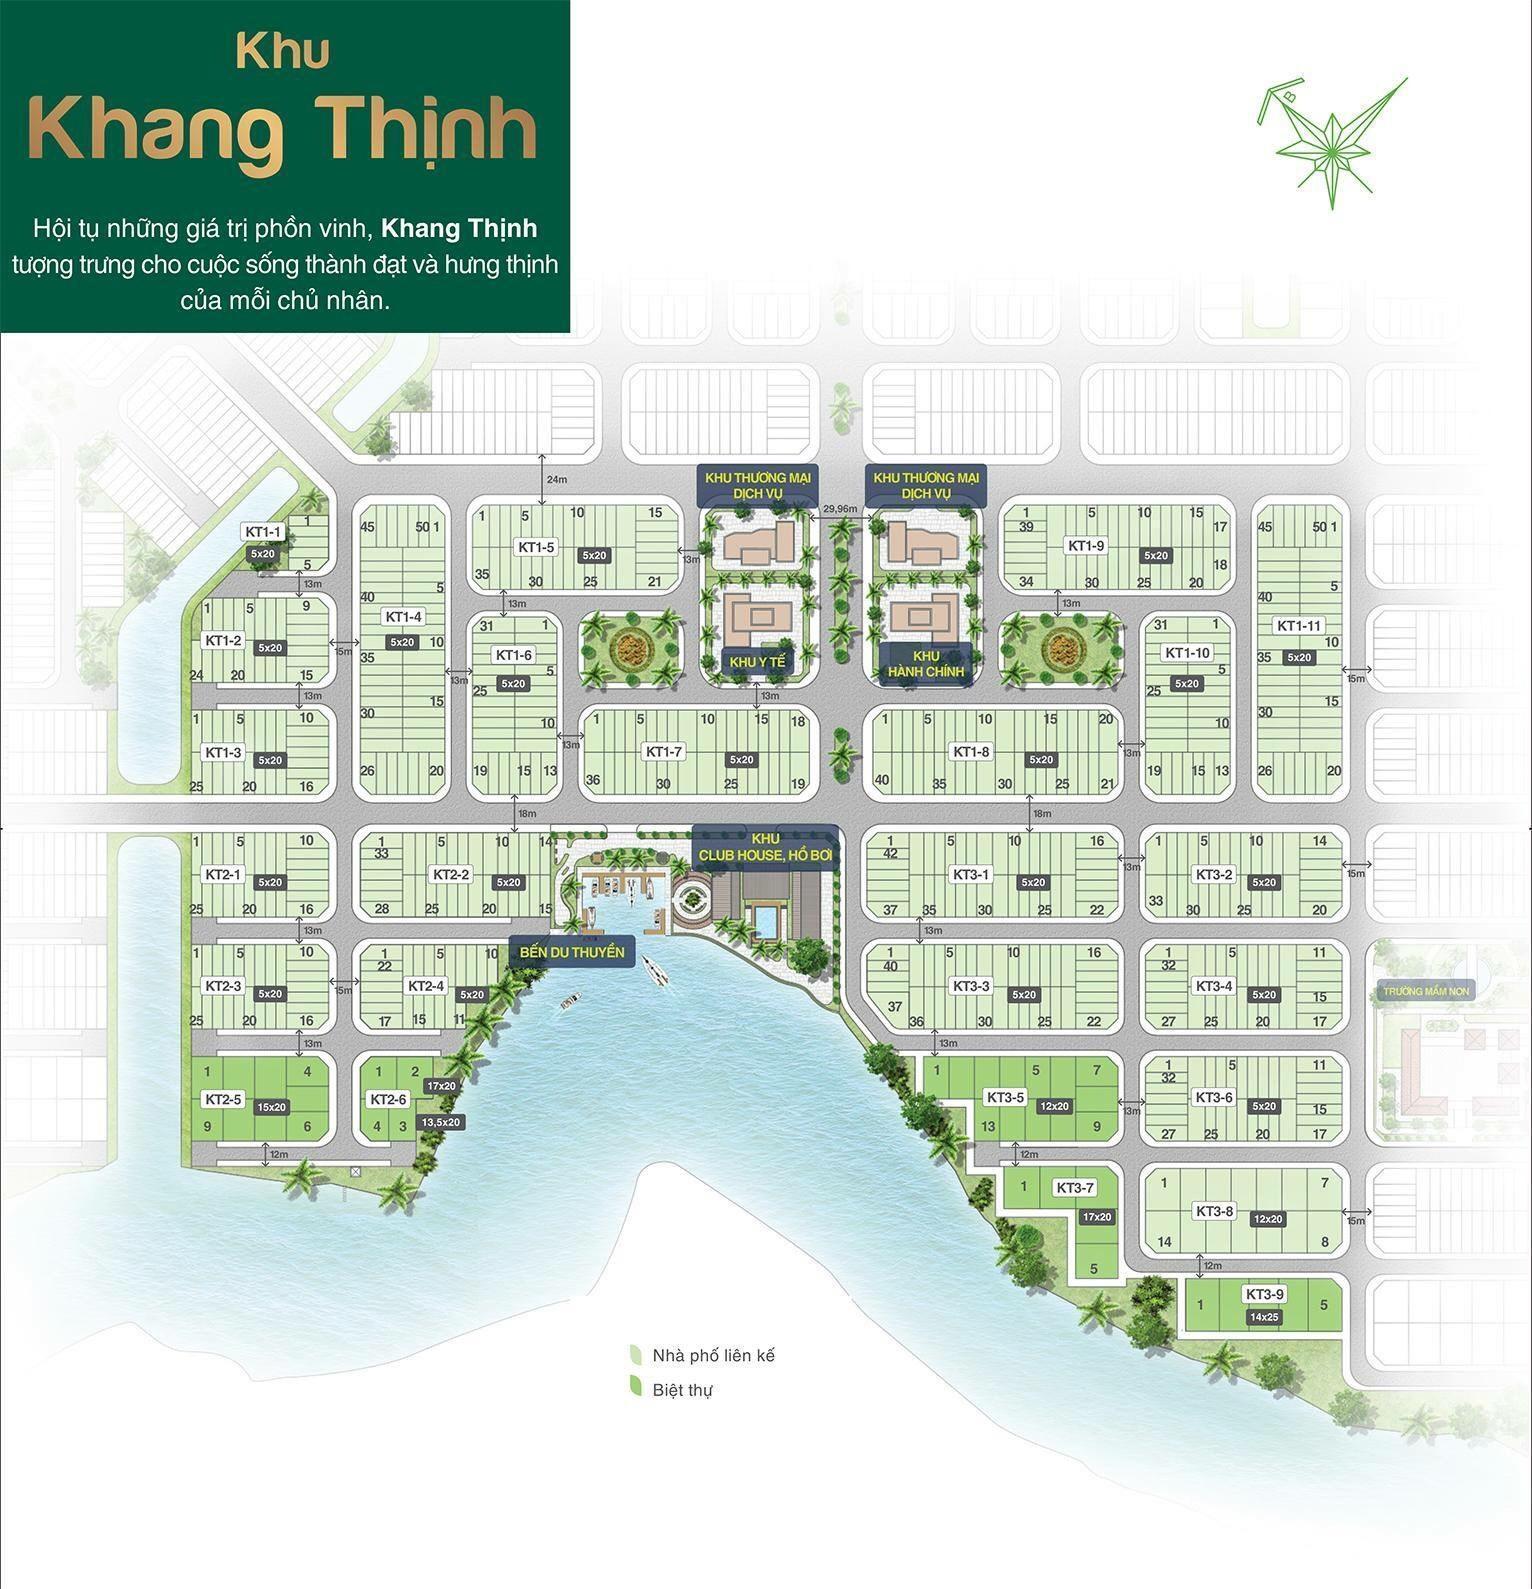 Mat bang bien hoa new city khu khang thinh